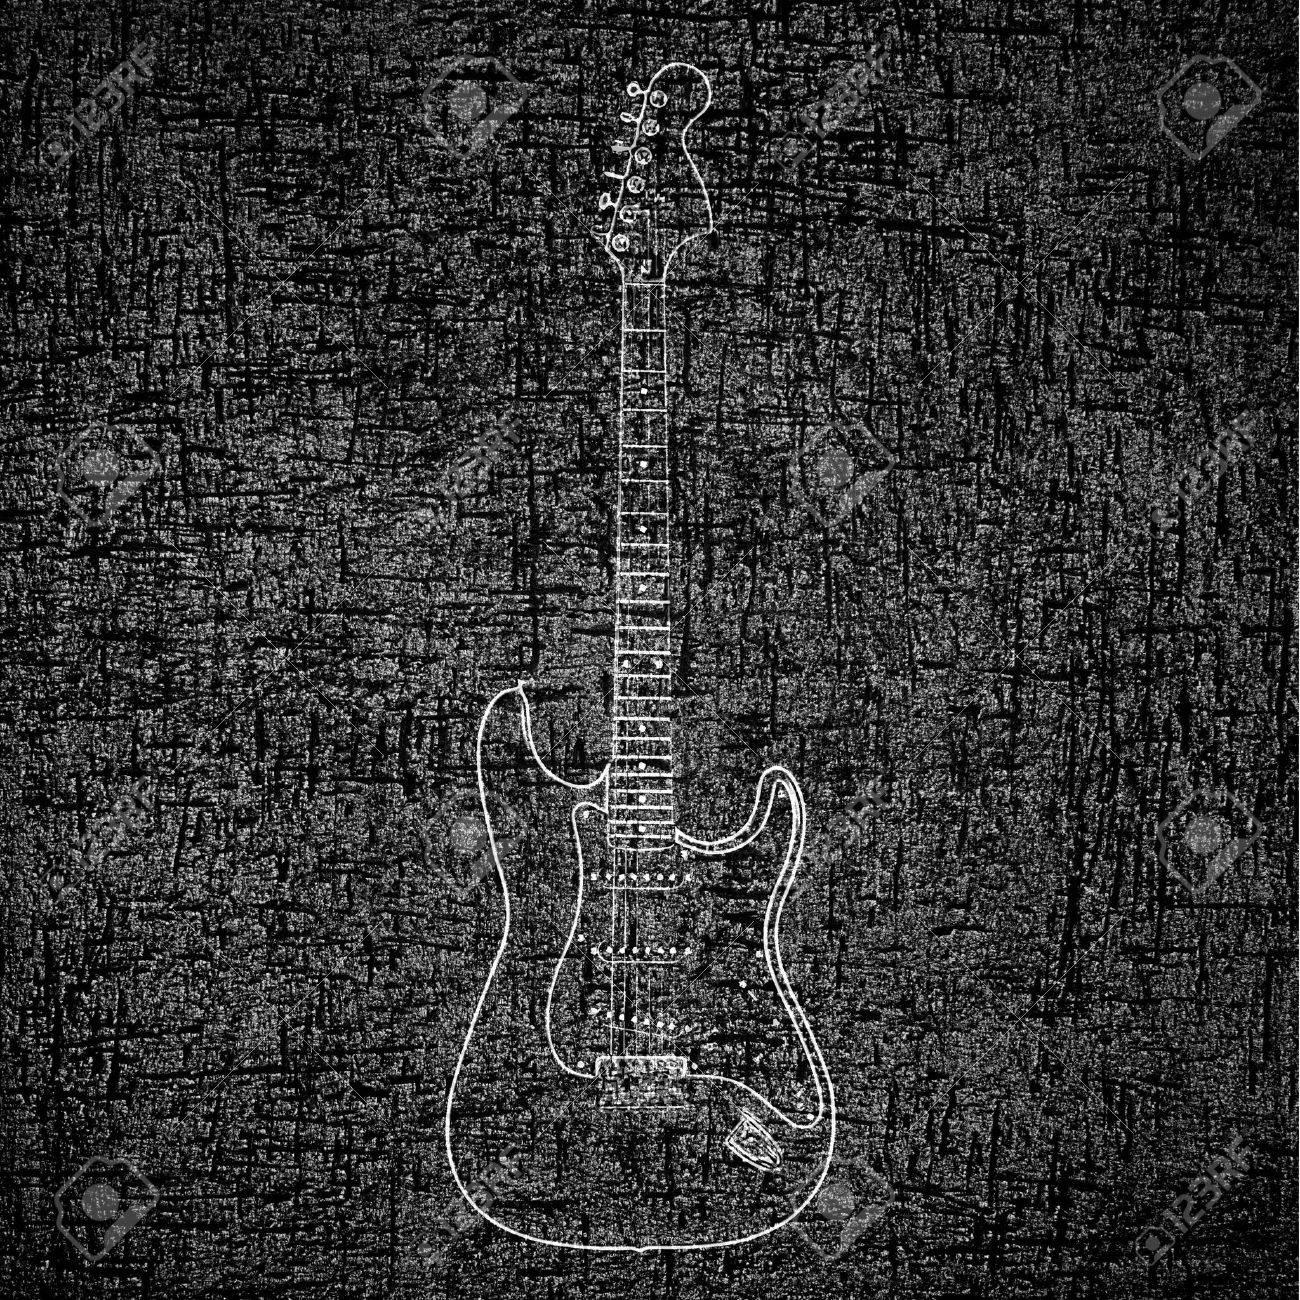 Pics photos rock concert background - Electric Guitar Background Stock Photo 12705900